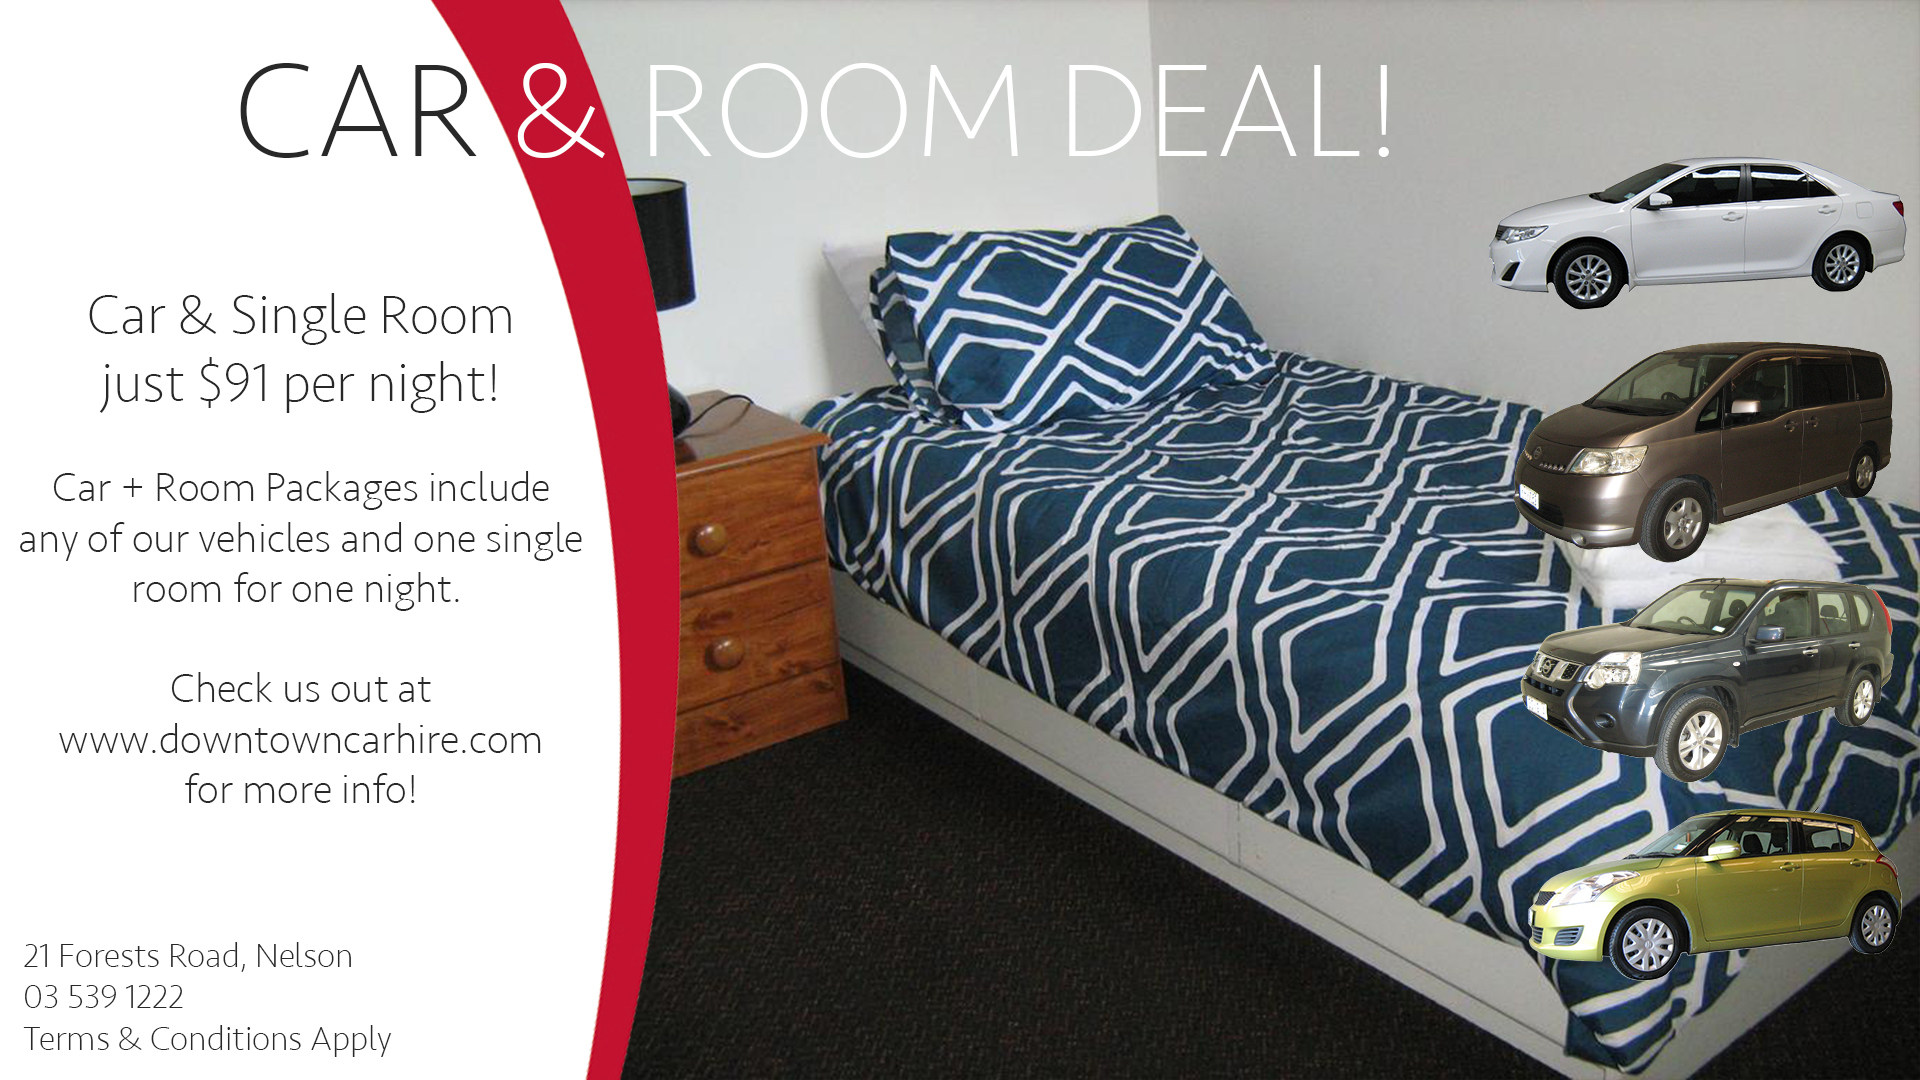 Car + Room Deal - Single Room.jpg